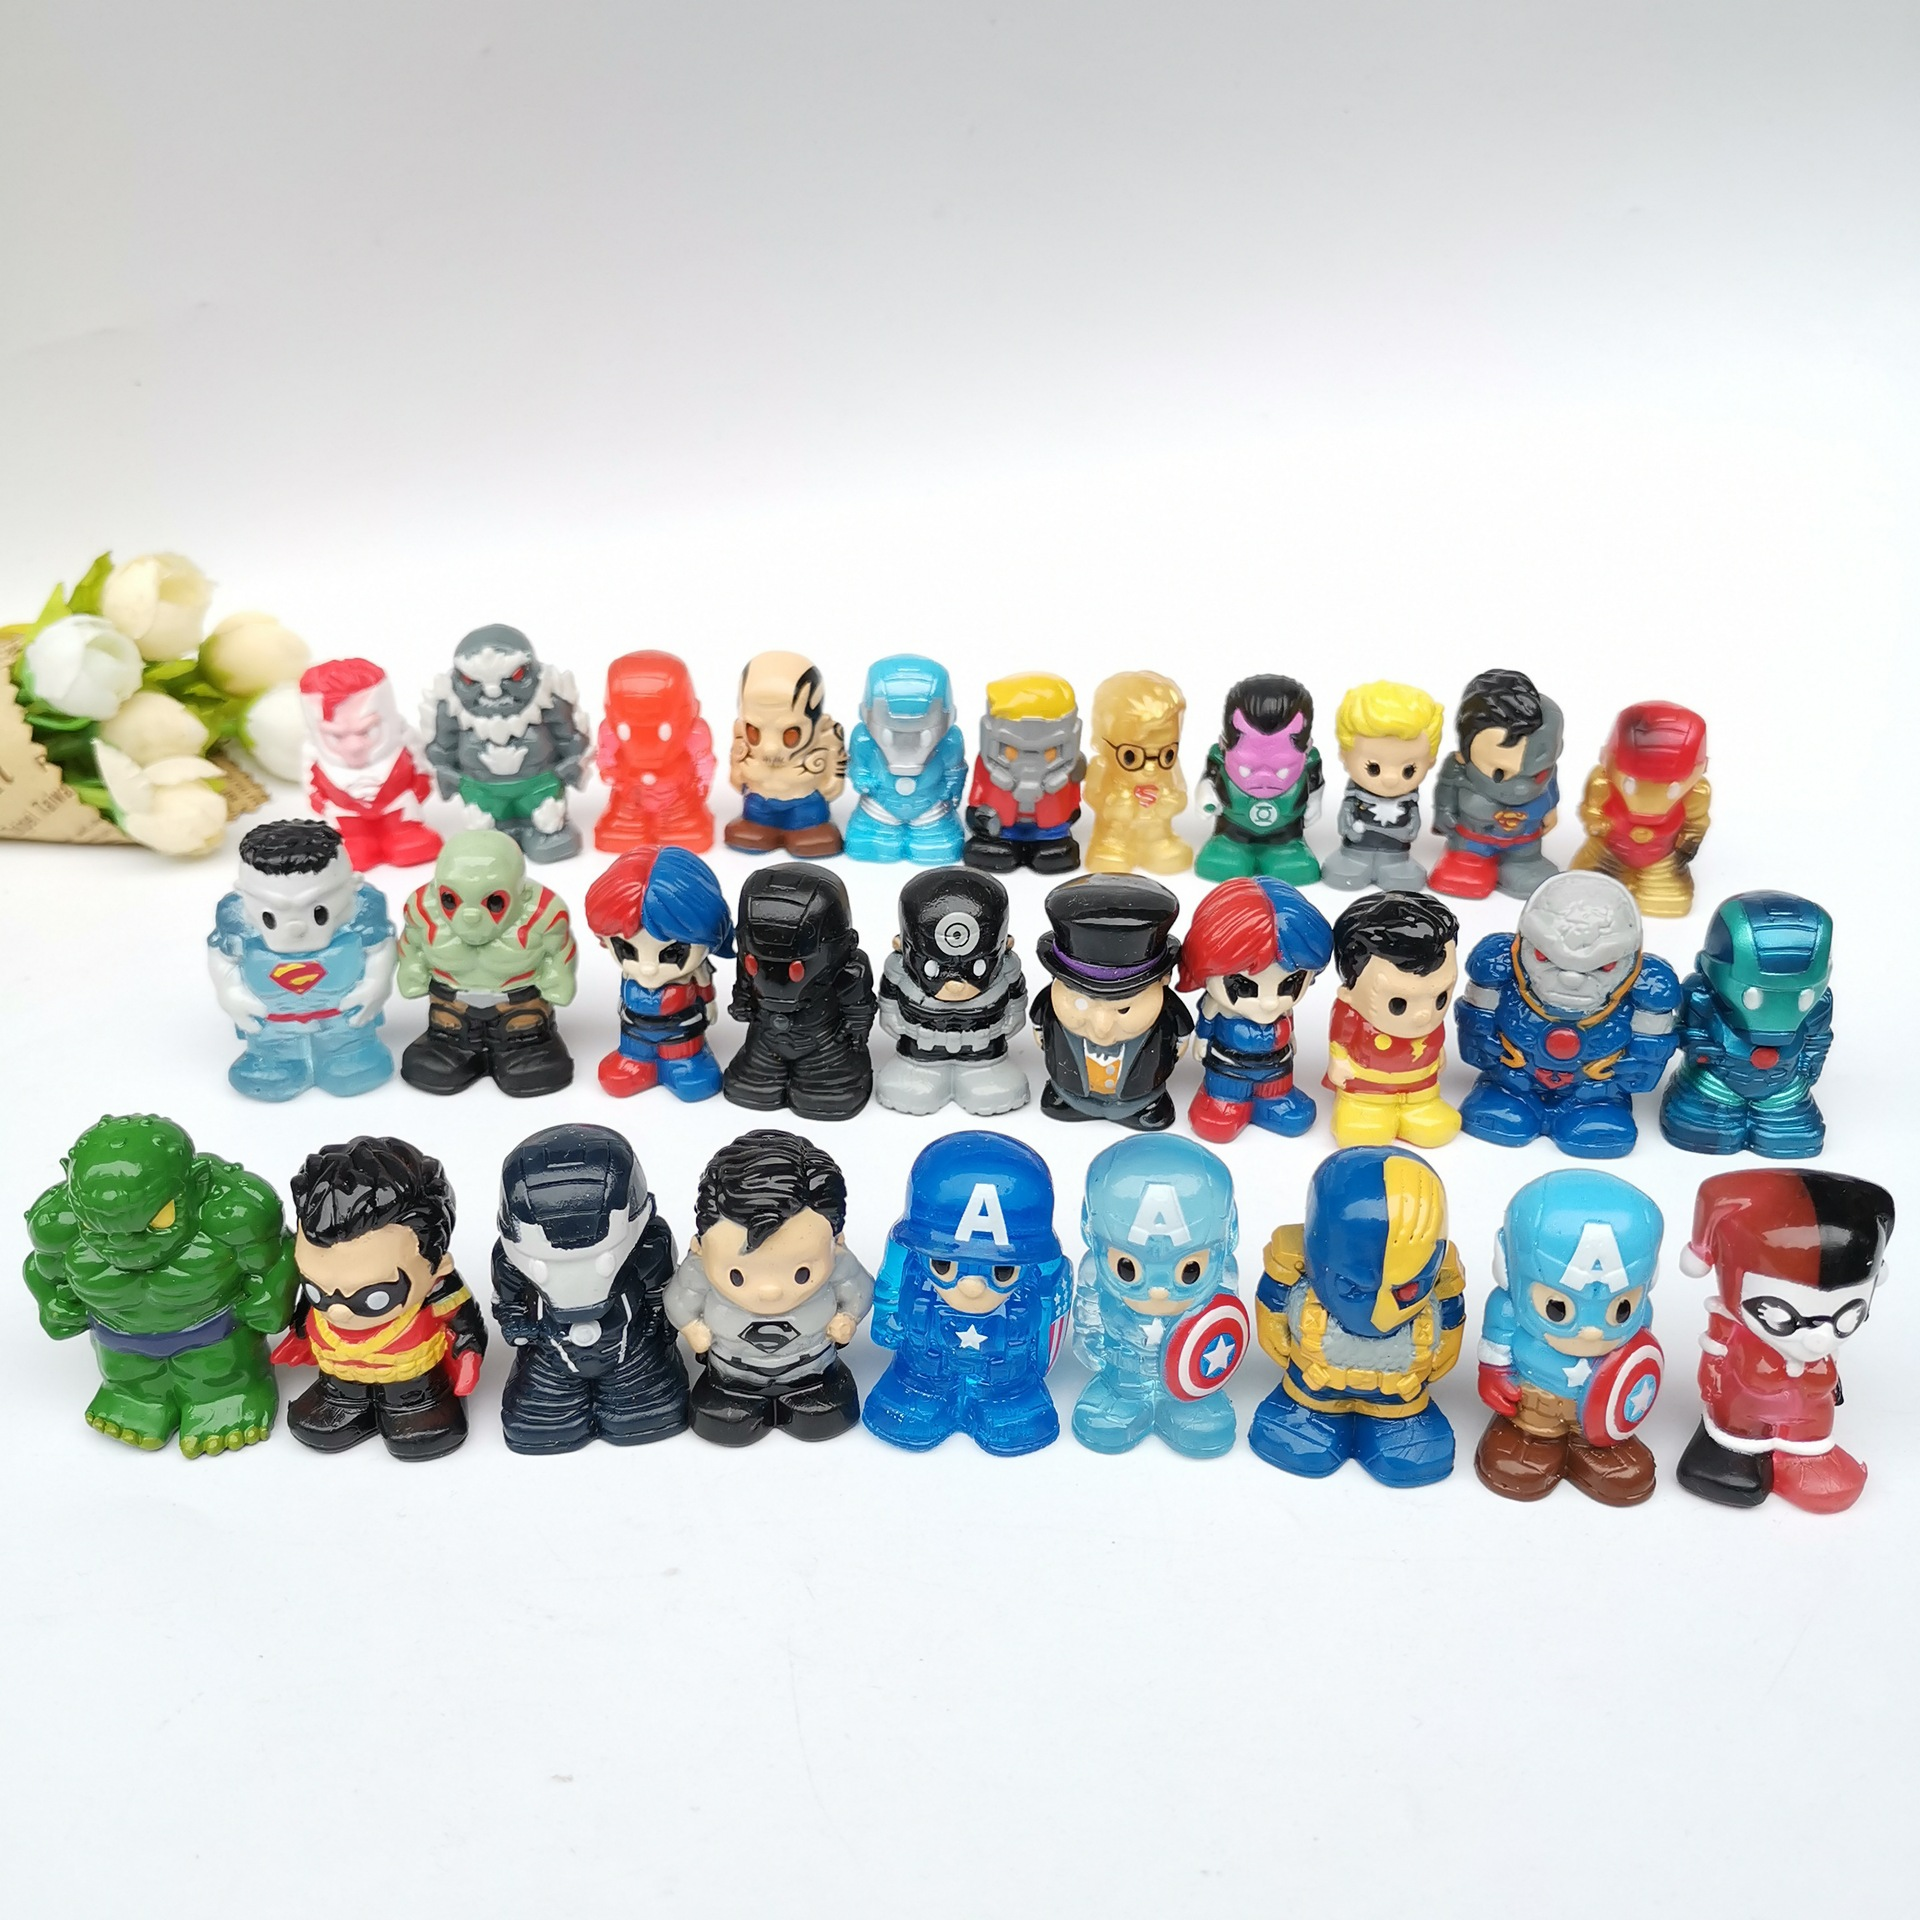 10pcs/lot 4-5cm HOT Anime  Action Figures Super Heros Soft Rubber Vinyl Cartoon Toy Doll Plastic PVC Gifts